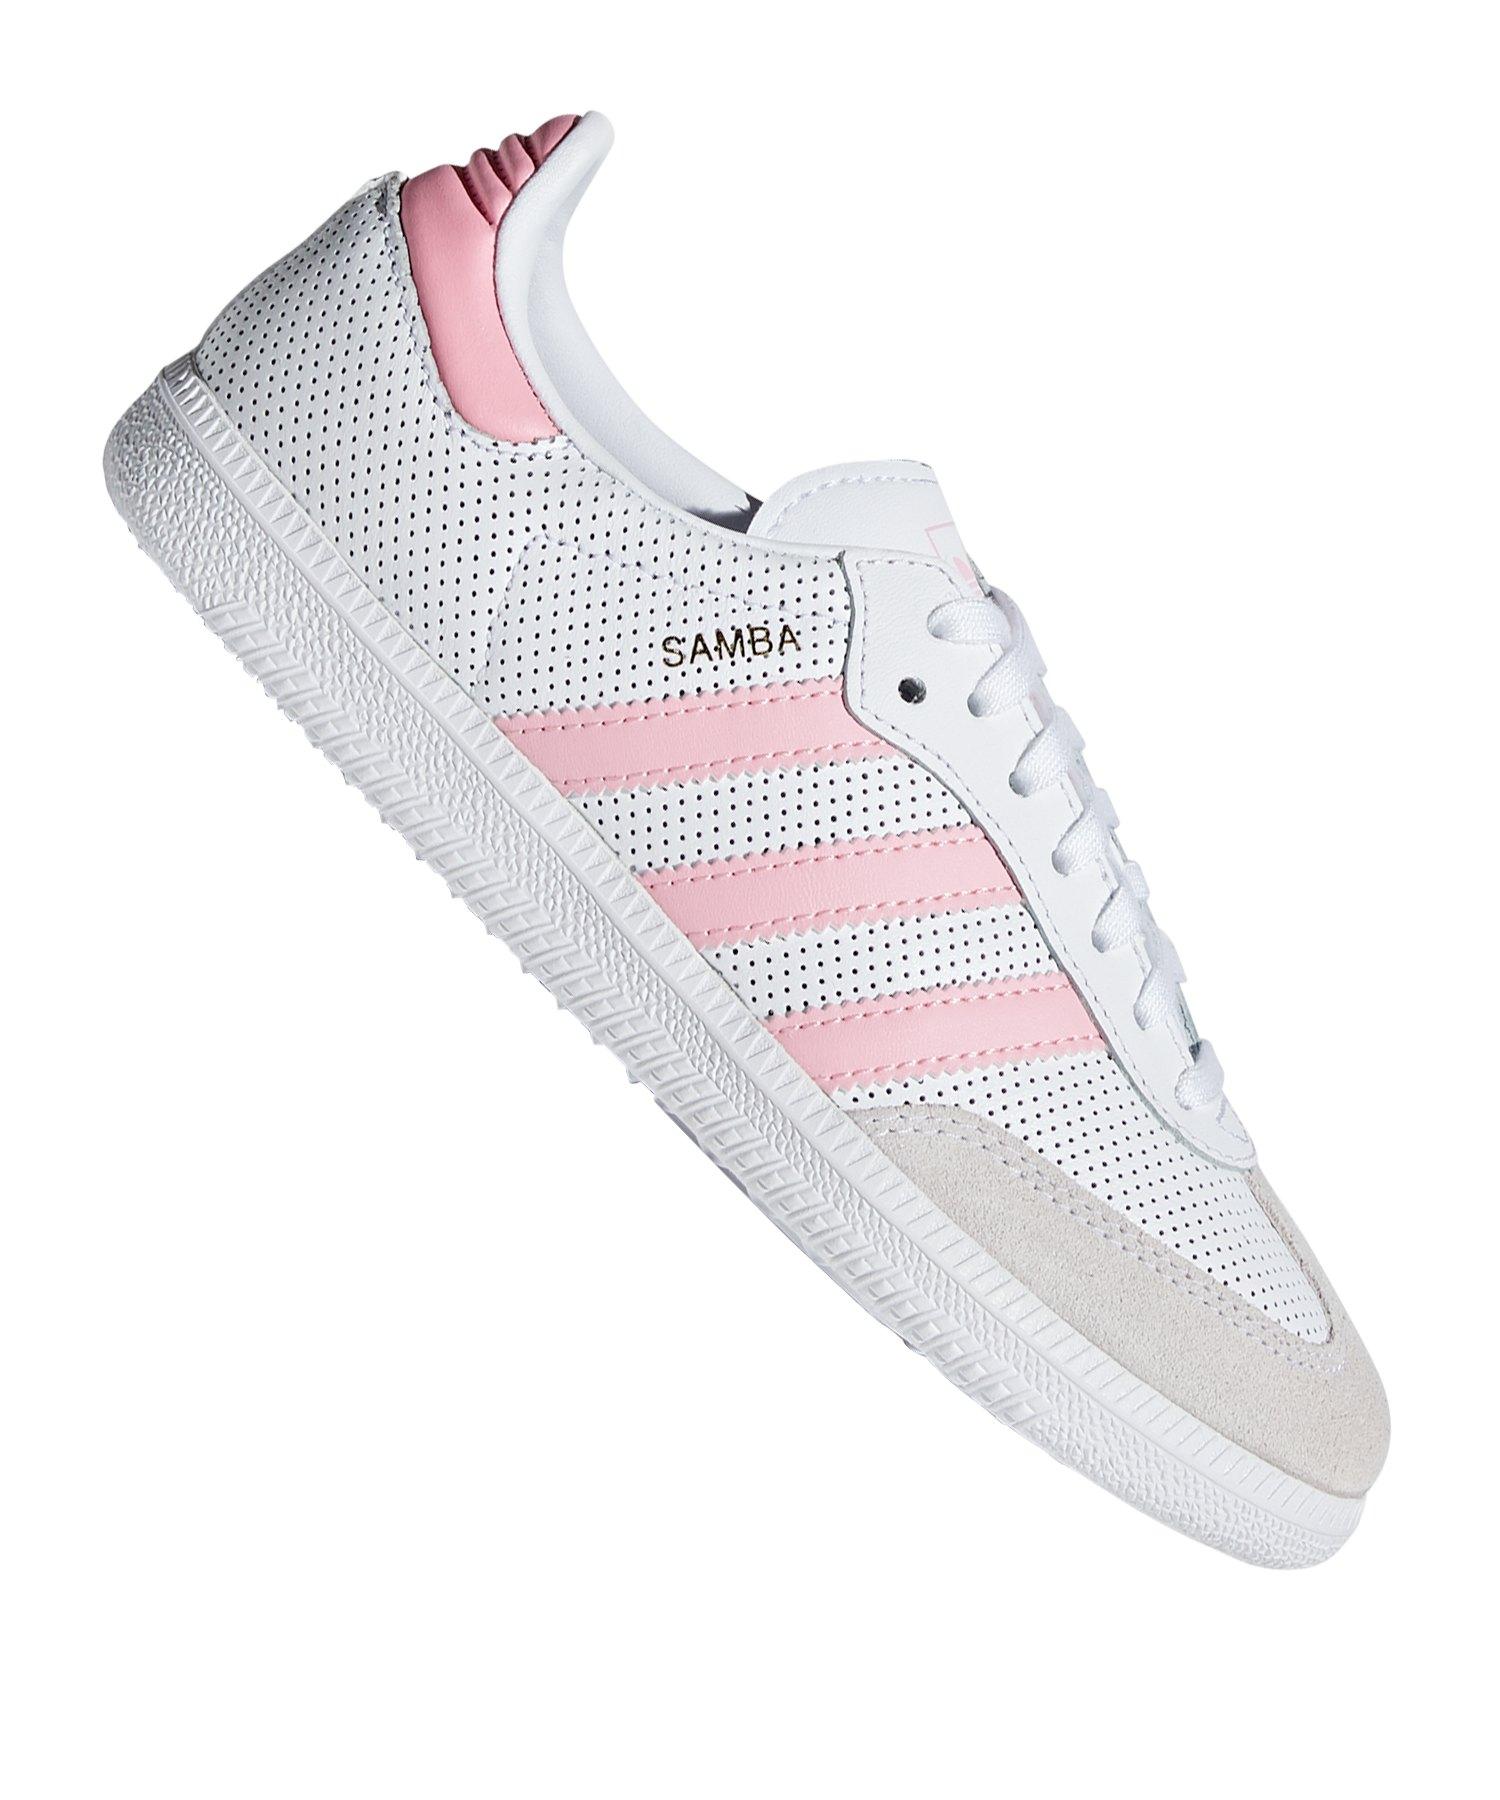 Originals Pink Weiss Adidas Sneaker Kids Samba IbgYvmf76y